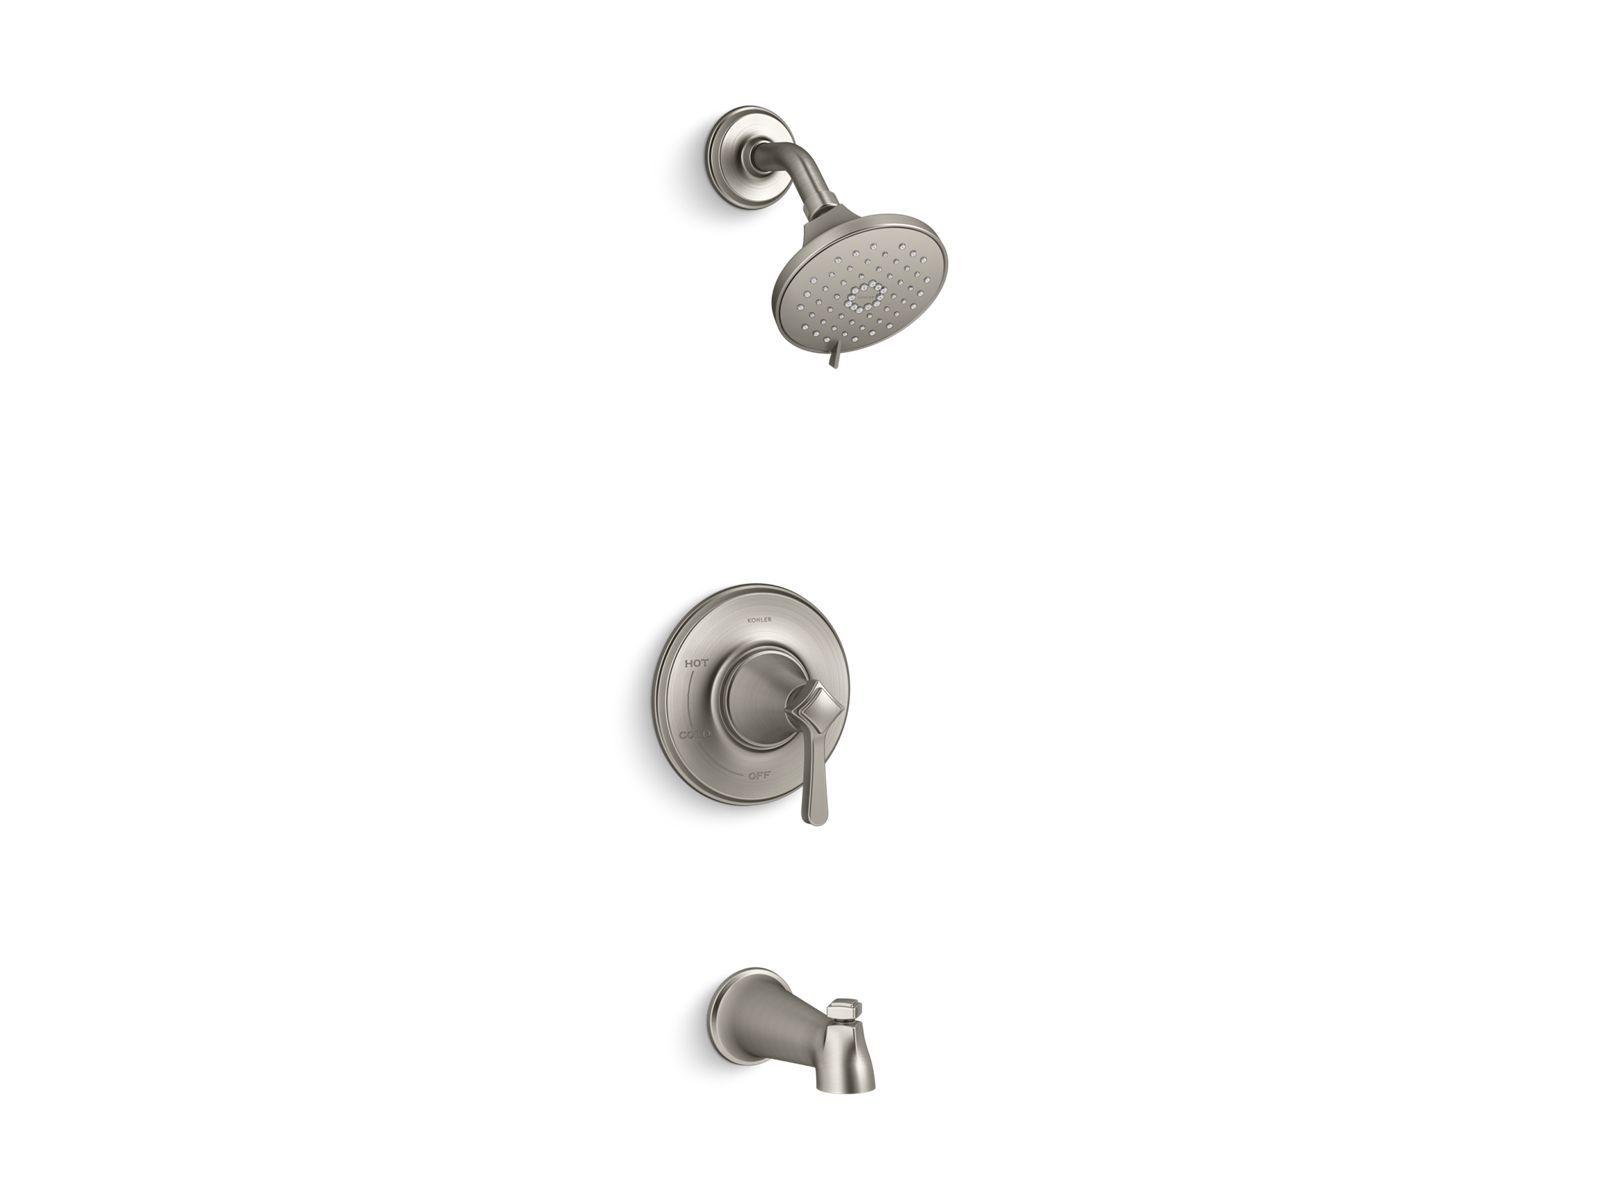 K-R99913-4 | Georgeson Bath and Shower Faucet Set | KOHLER ...